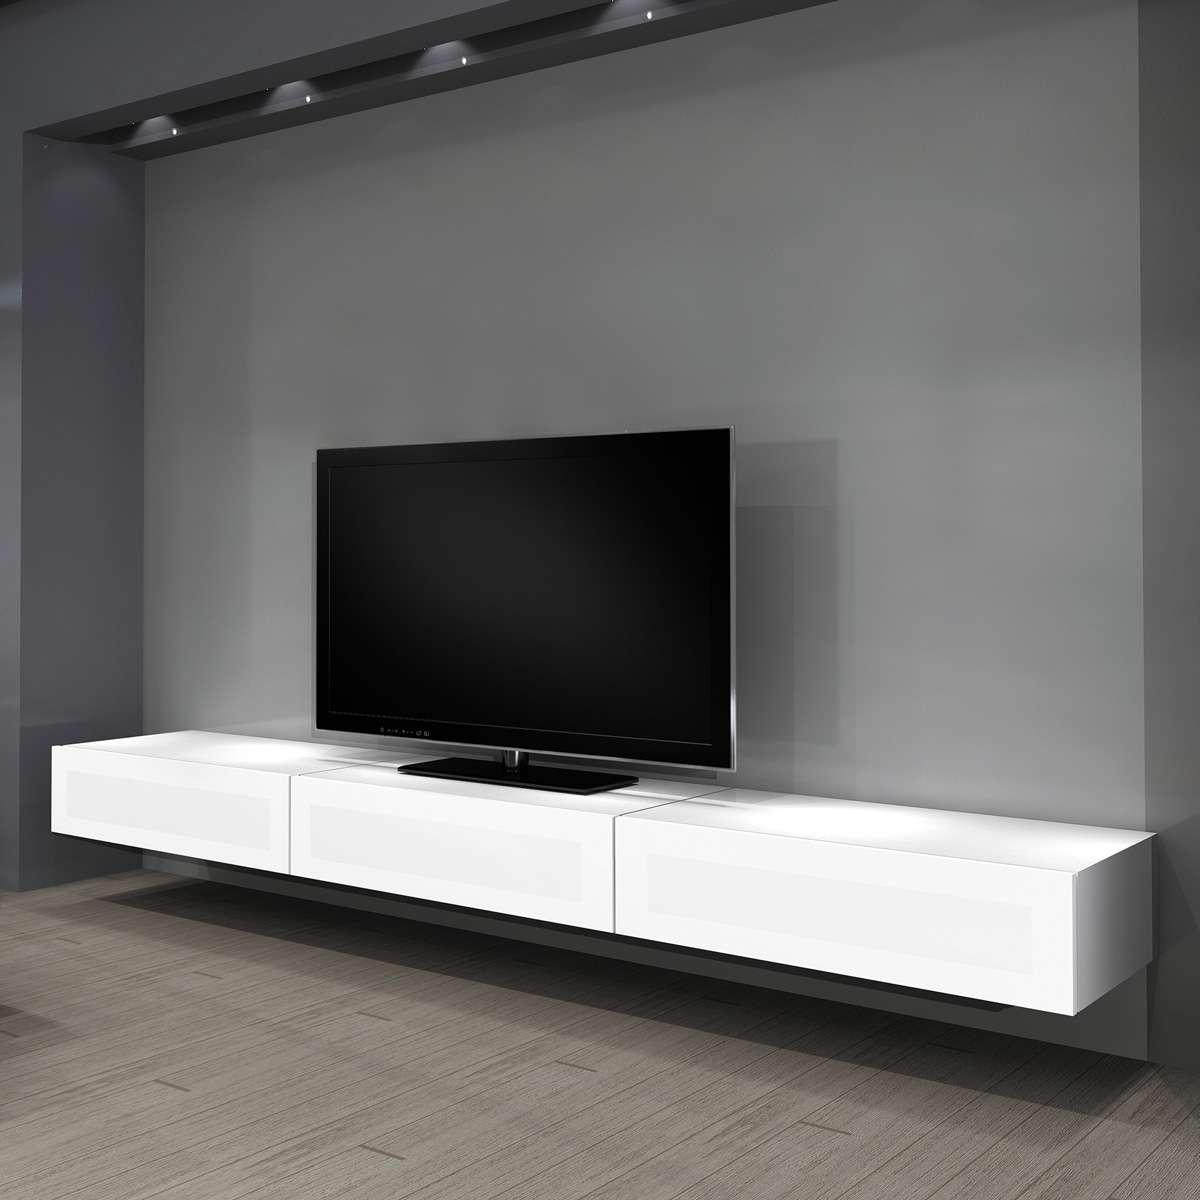 Wall Mounted Tv Cabinet Sliding Doors – Trekkerboy With Regard To Wall Mounted Tv Cabinets With Sliding Doors (View 17 of 20)